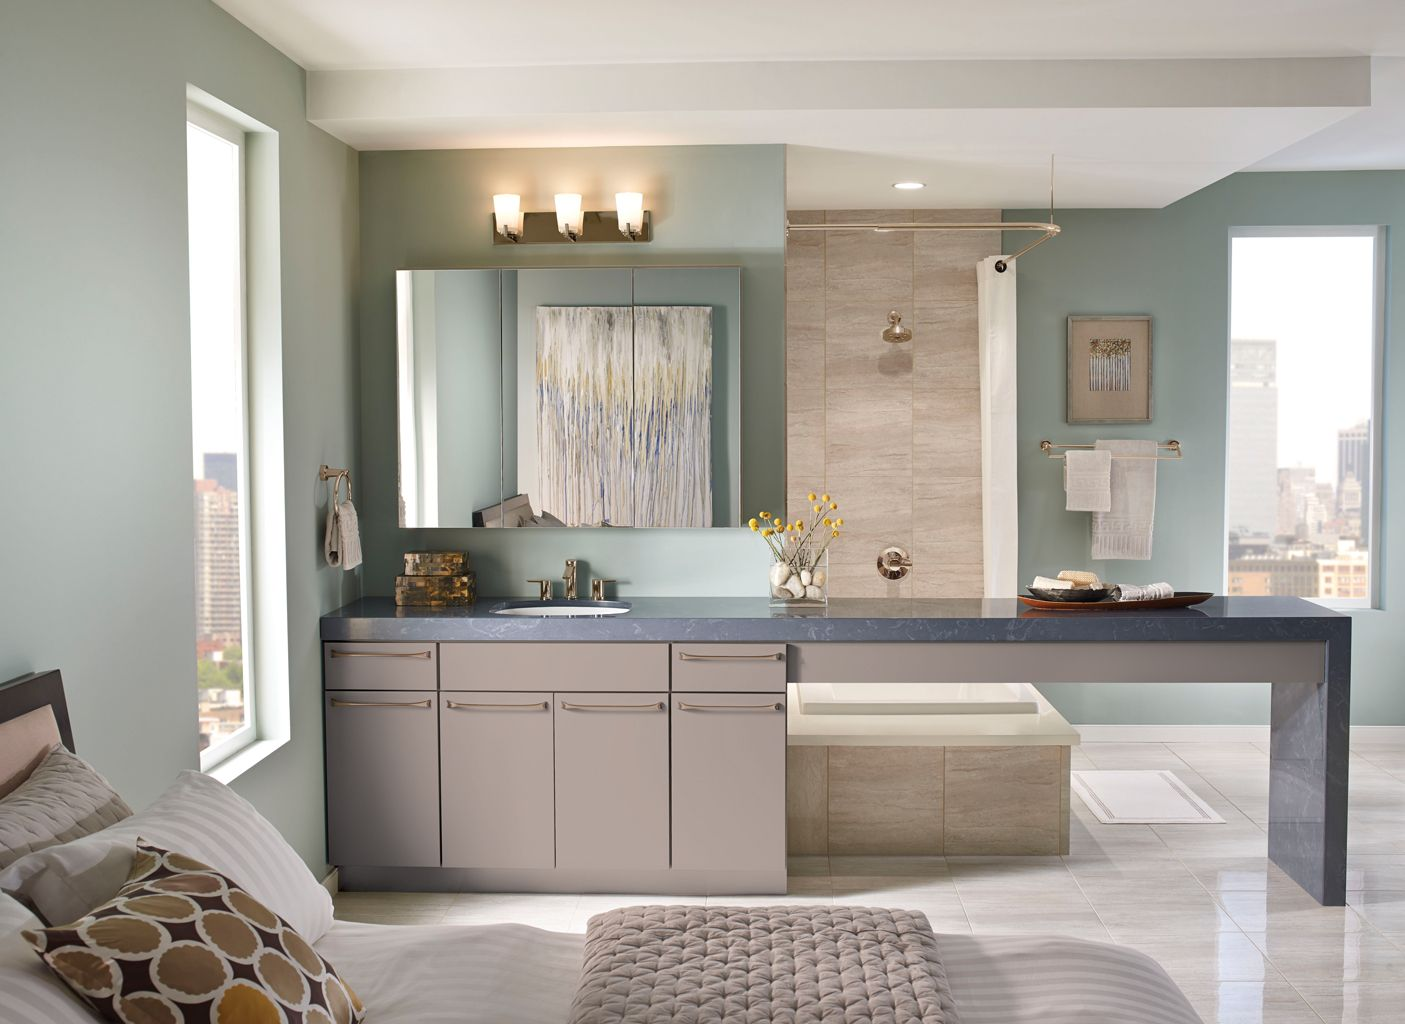 Kraftmaid grey kitchen cabinets - Kraftmaid Avery Maple Pebble Grey